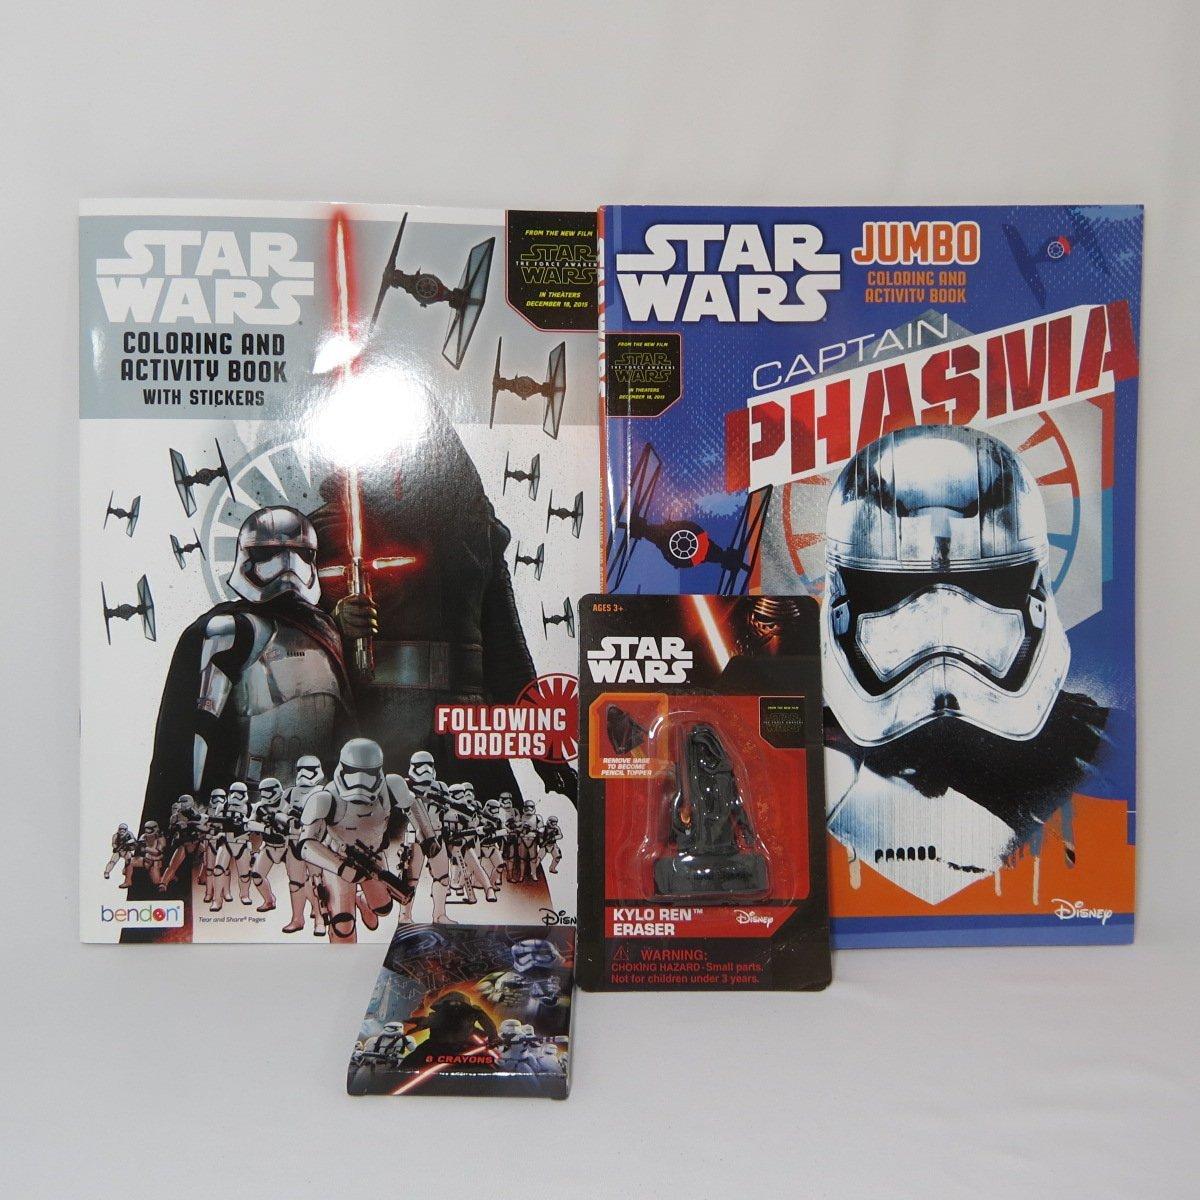 Buy Star Wars Jumbo Coloring & Activity Book, Kylo Ren Coloring and